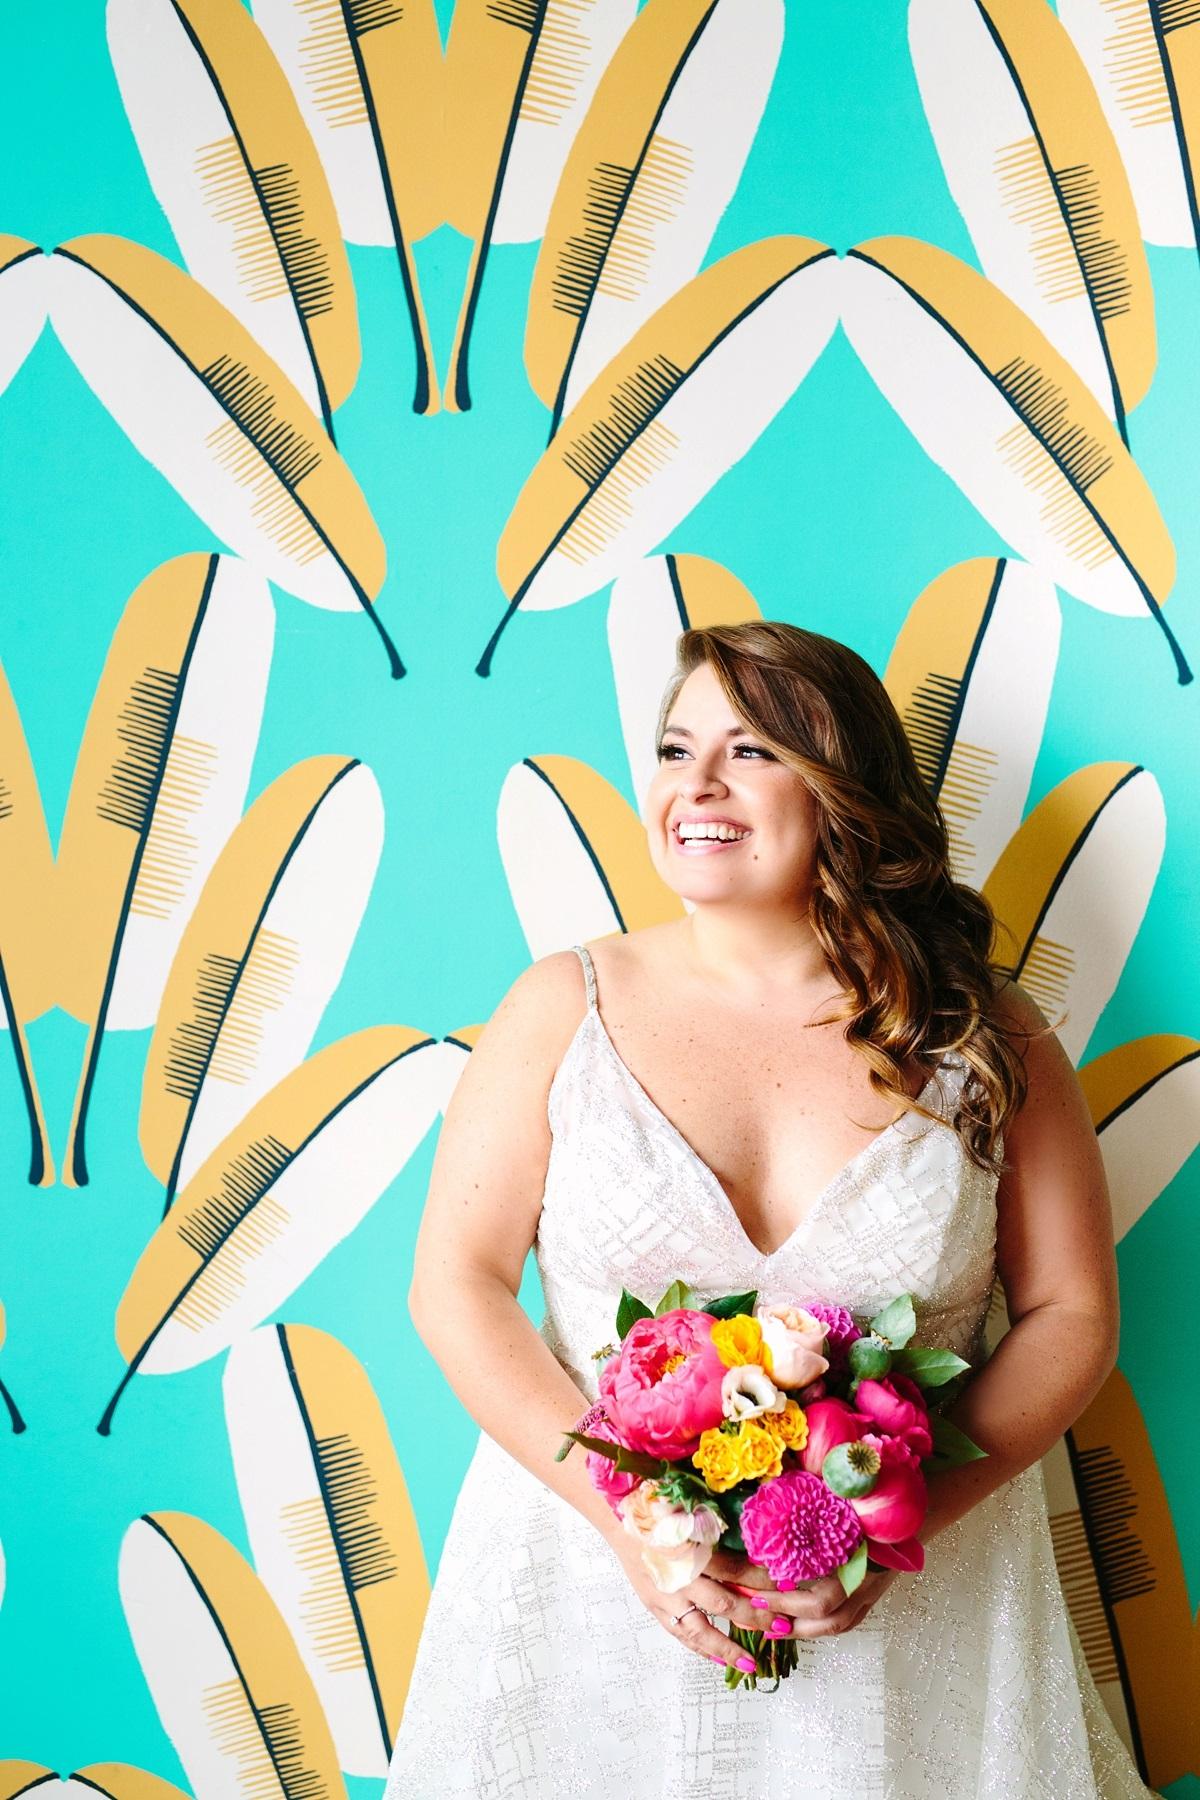 Plus size bruid voor opvallende muur